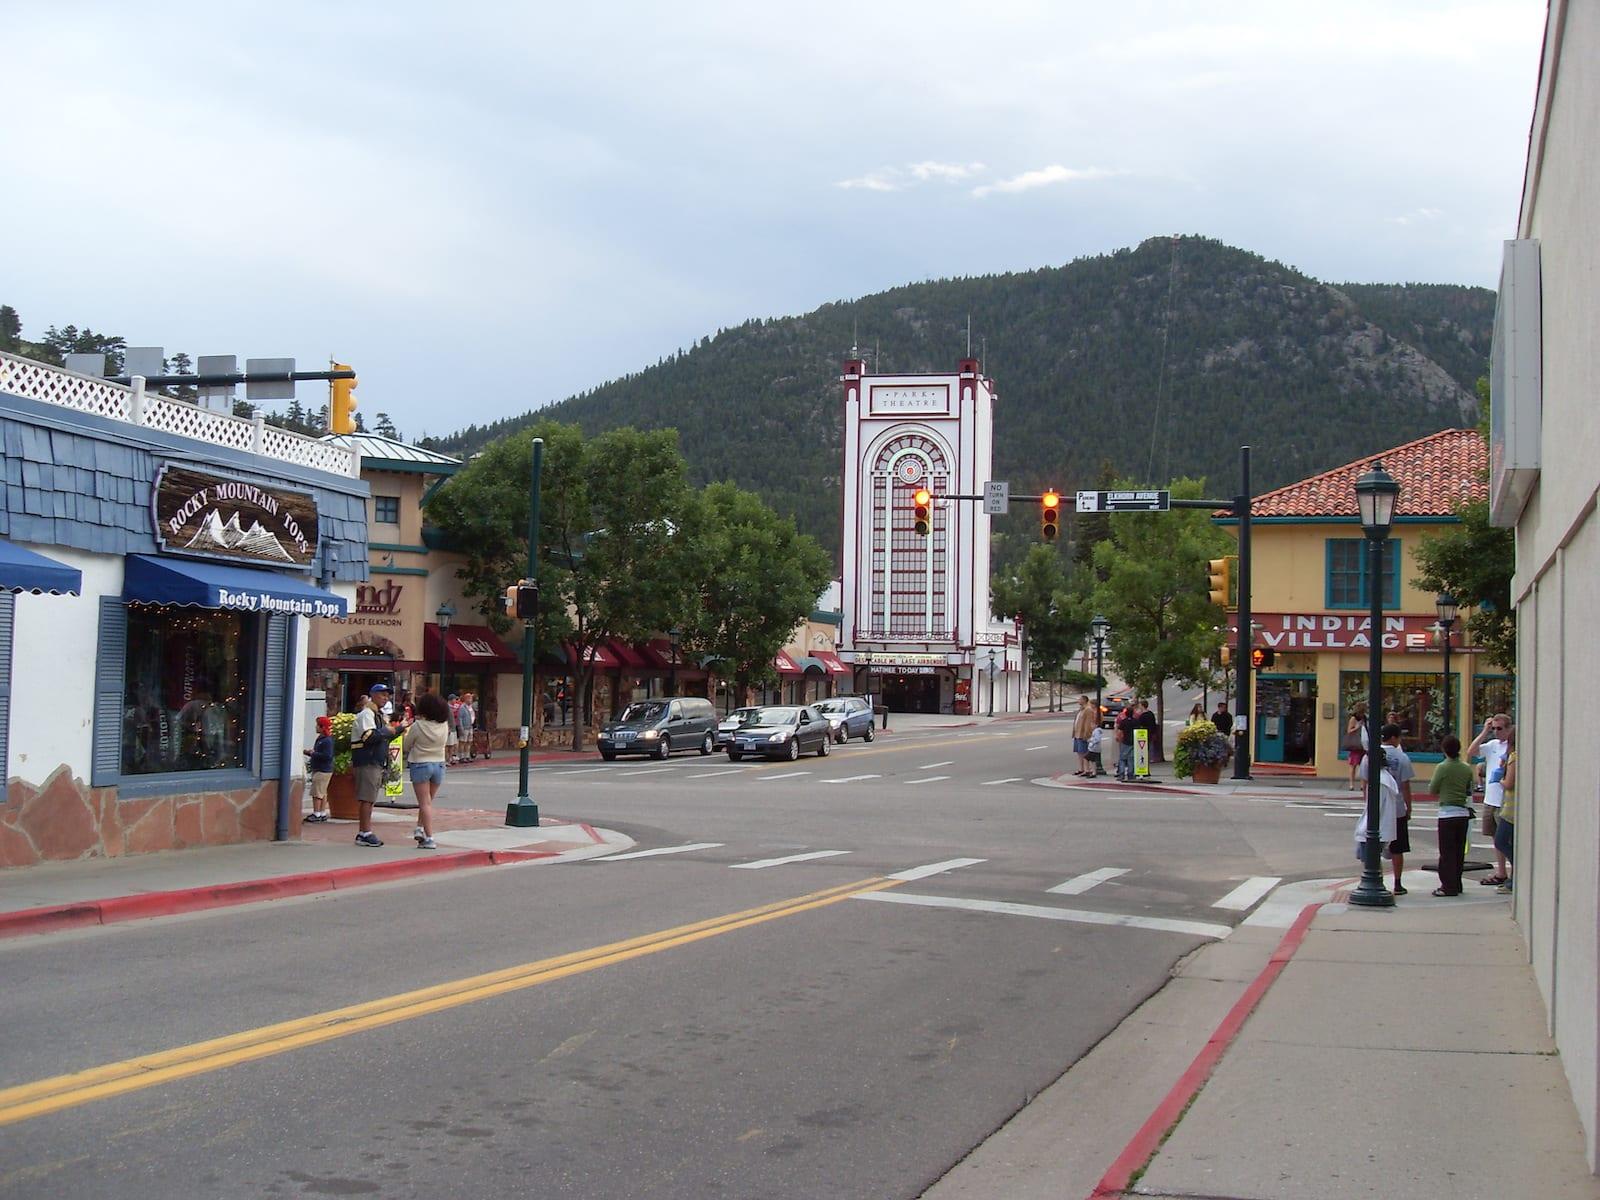 Estes Park city center, CO